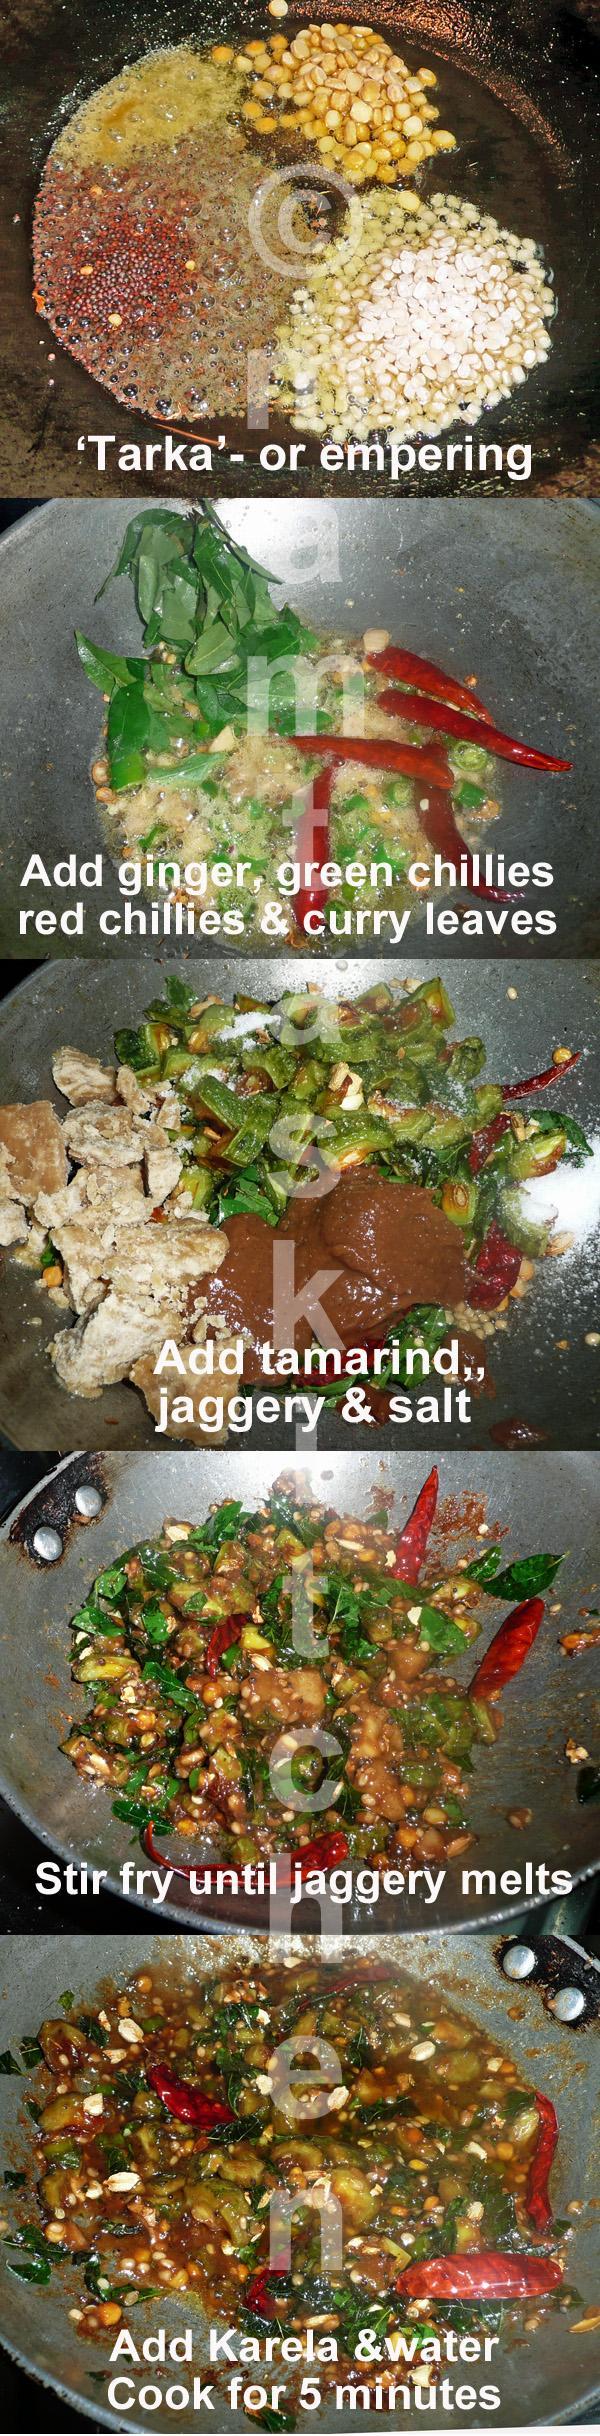 Karela (Bitter Gourd) Chutney with Tamarind